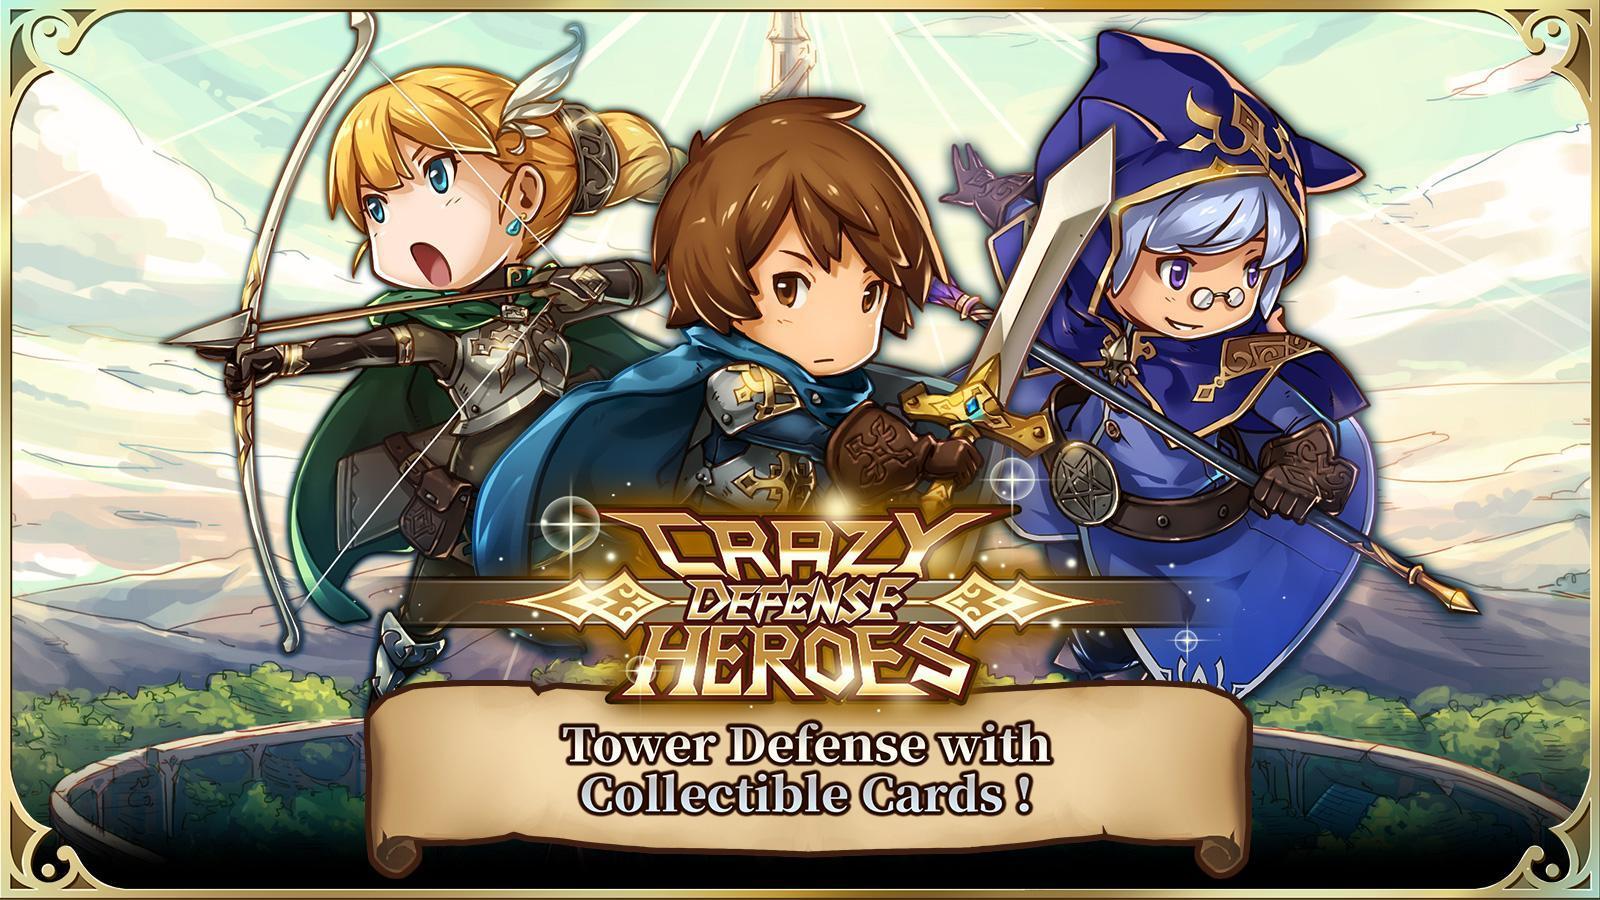 Crazy Defense Heroes: Tower Defense Strategy TD скачать 1.0.0 APK на Android